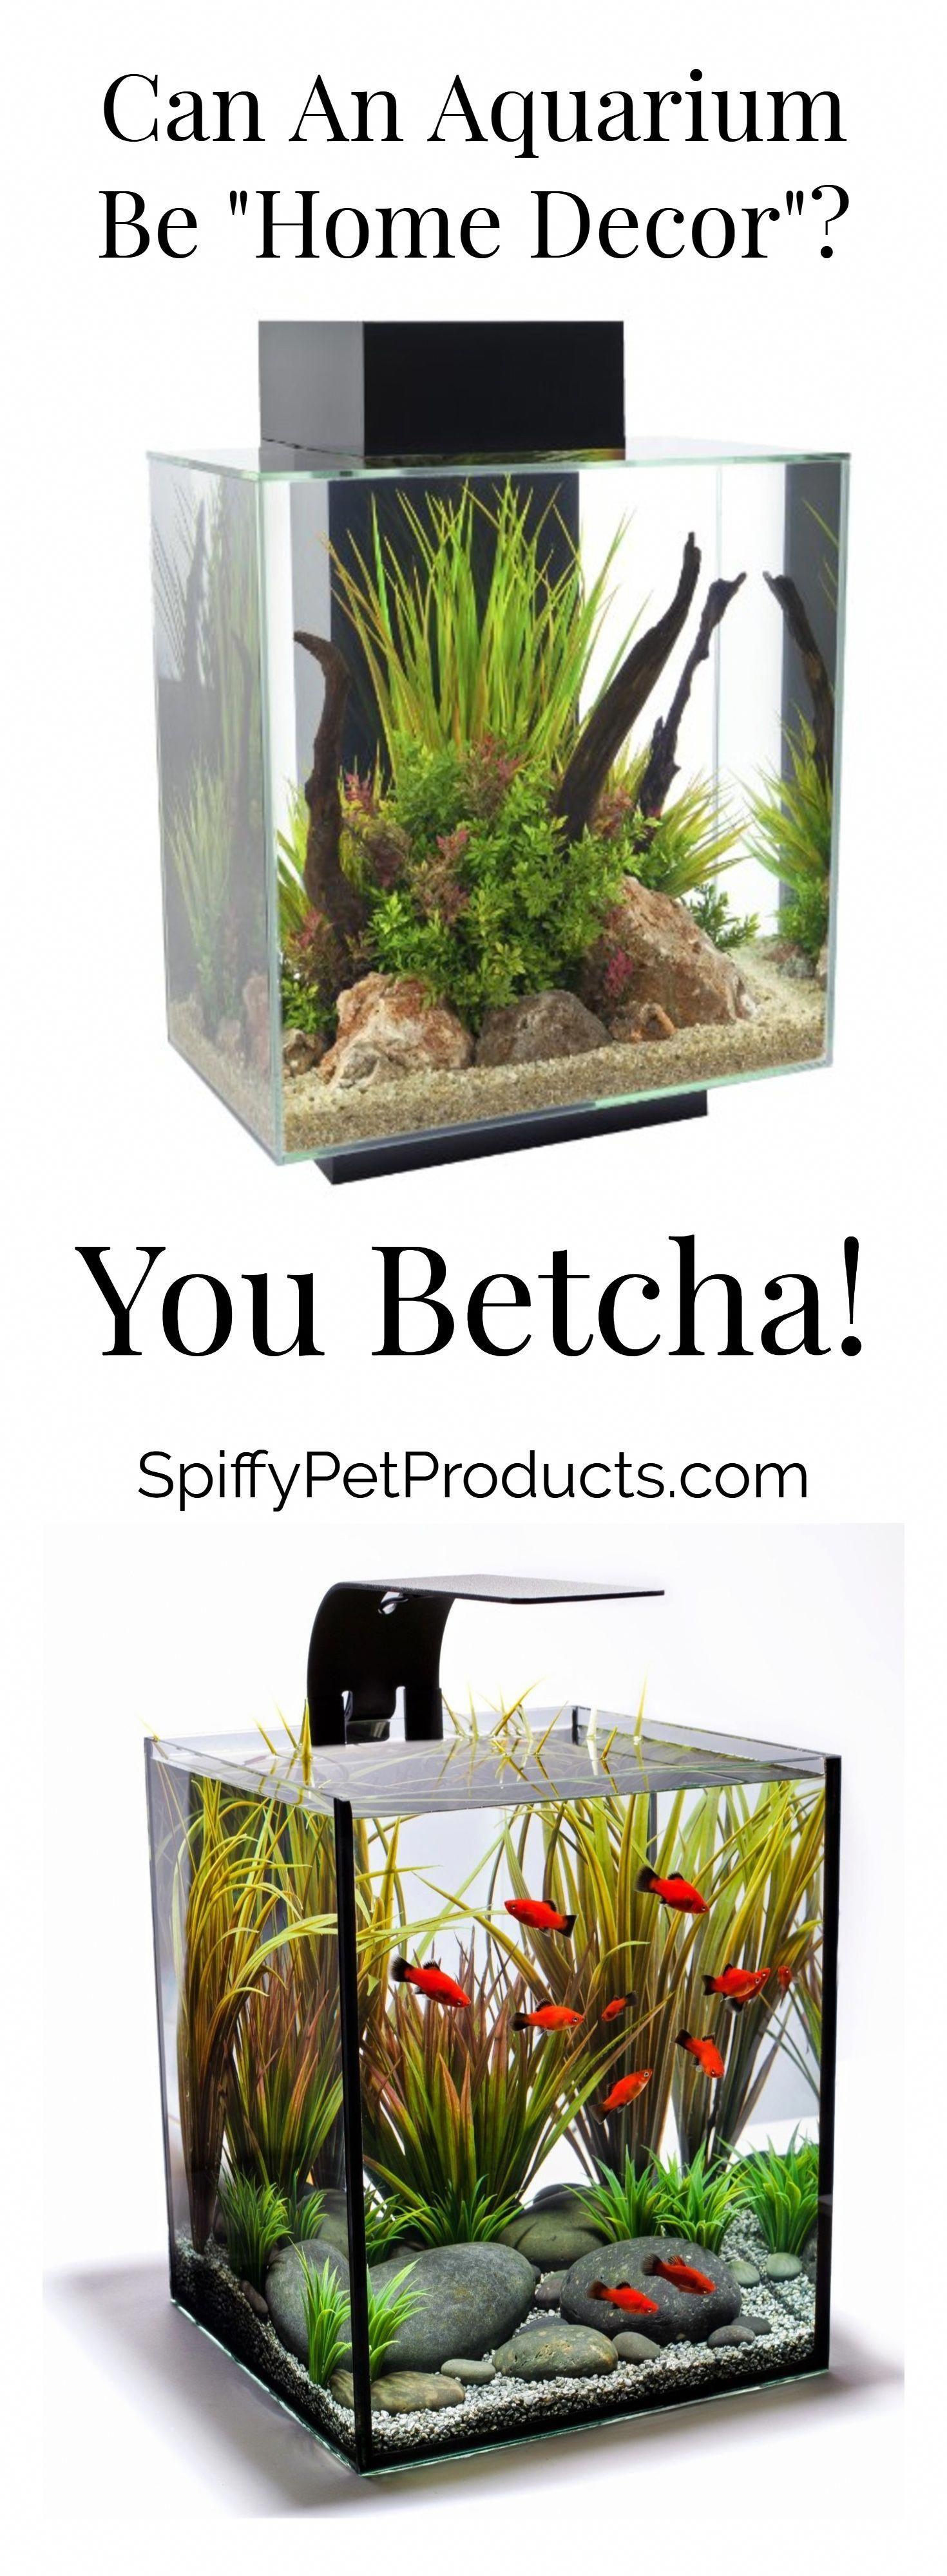 "You Betcha! / Can An Aquarium Be ""Home Decor"